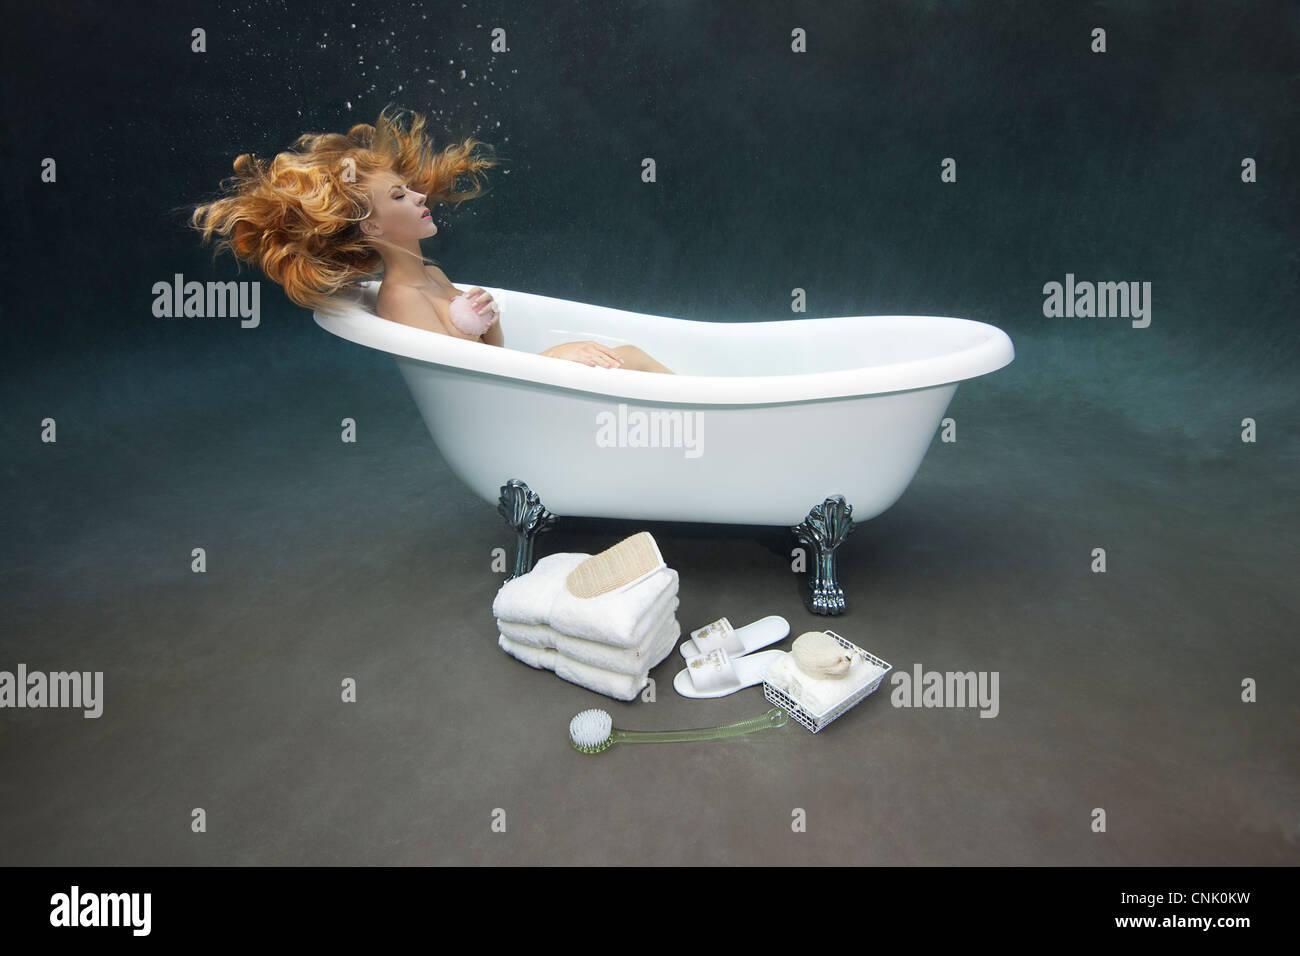 Young woman bathing herself underwater in her Victoria + Albert clawfoot bathtub - Stock Image